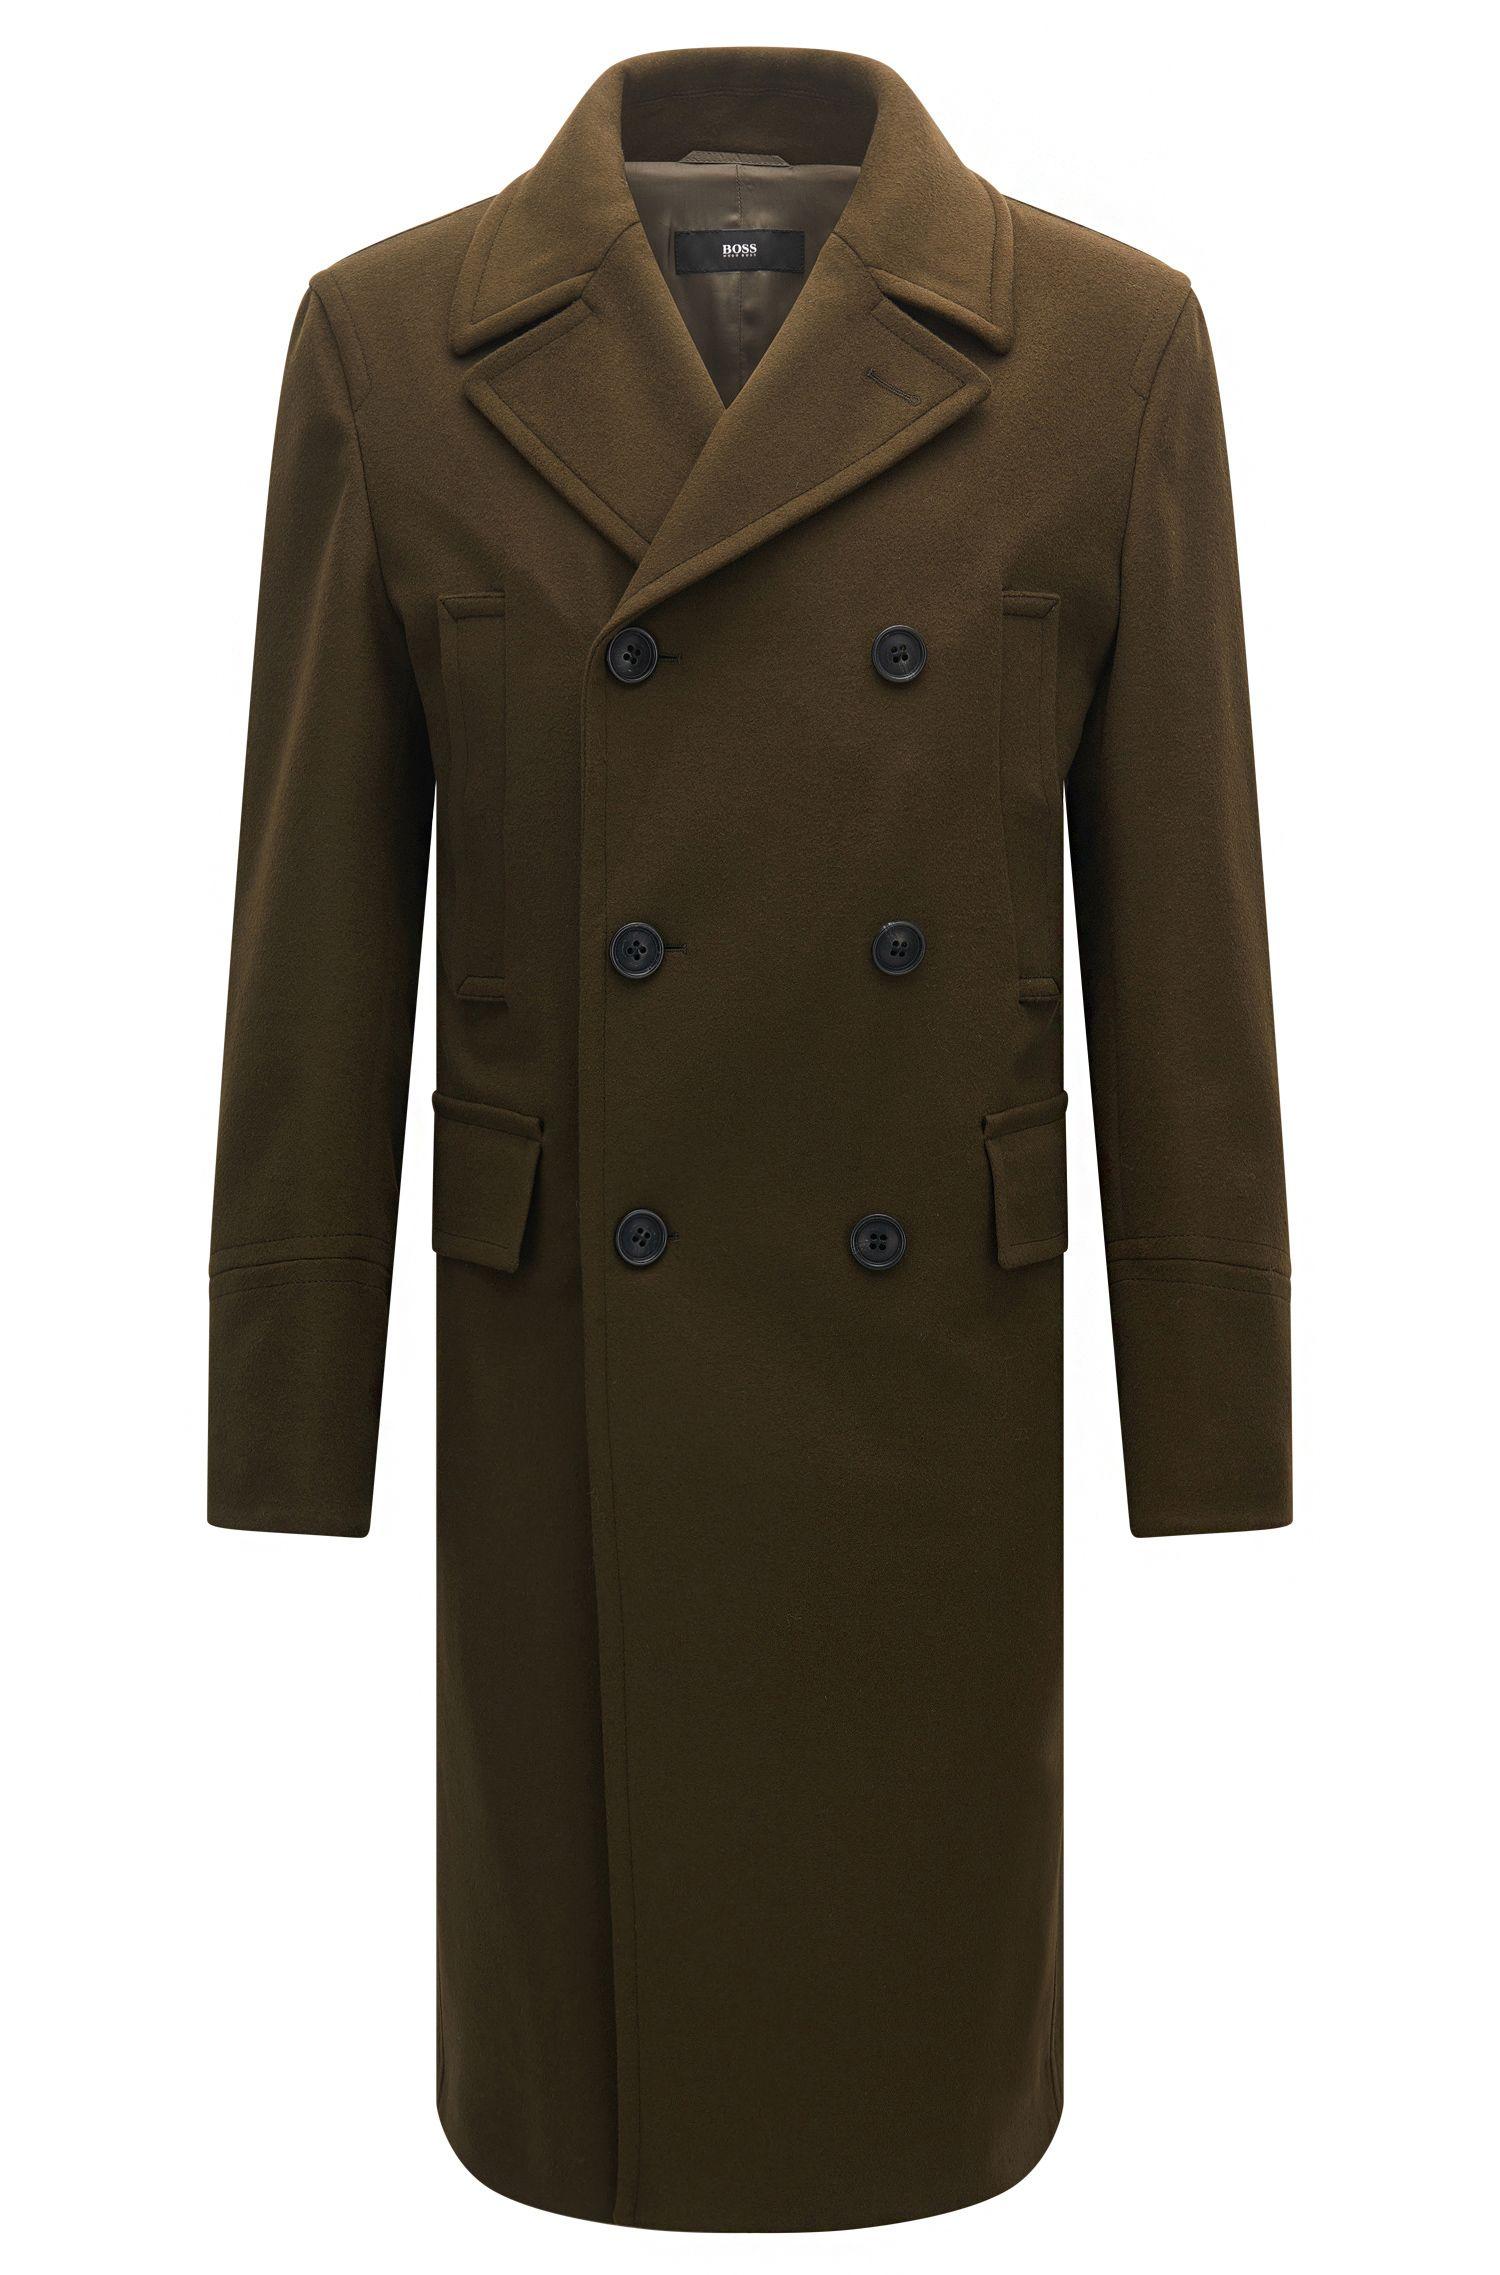 Abrigo cruzado slim fit en mezcla de lana